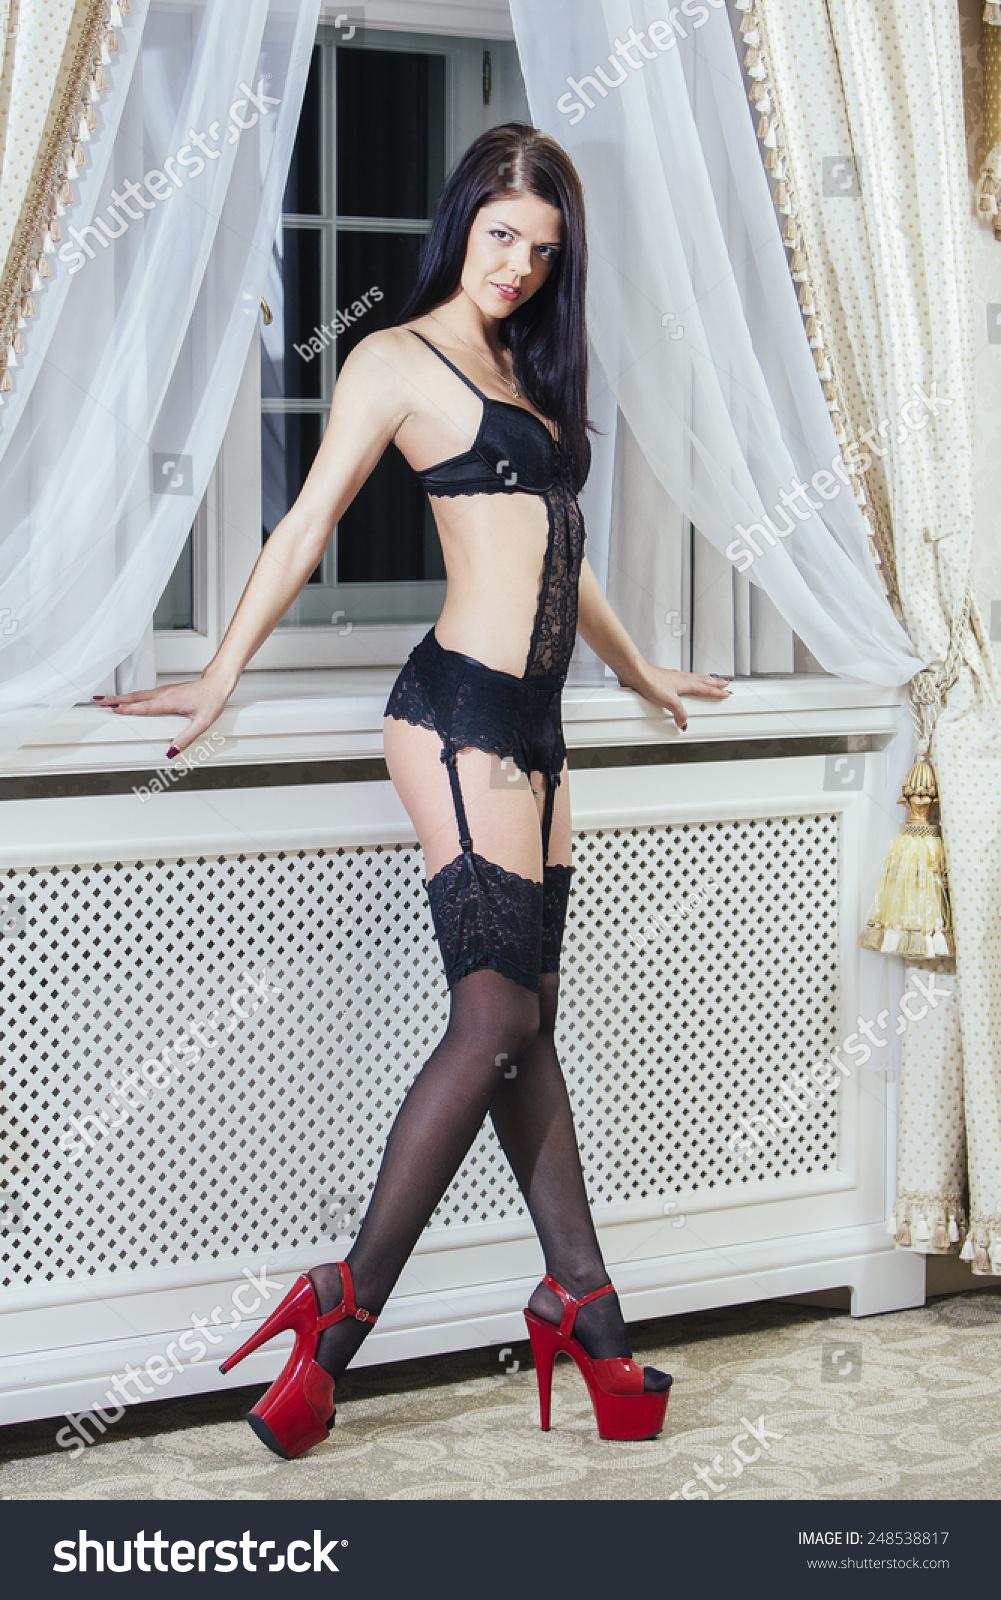 Sexy lingerie high heels